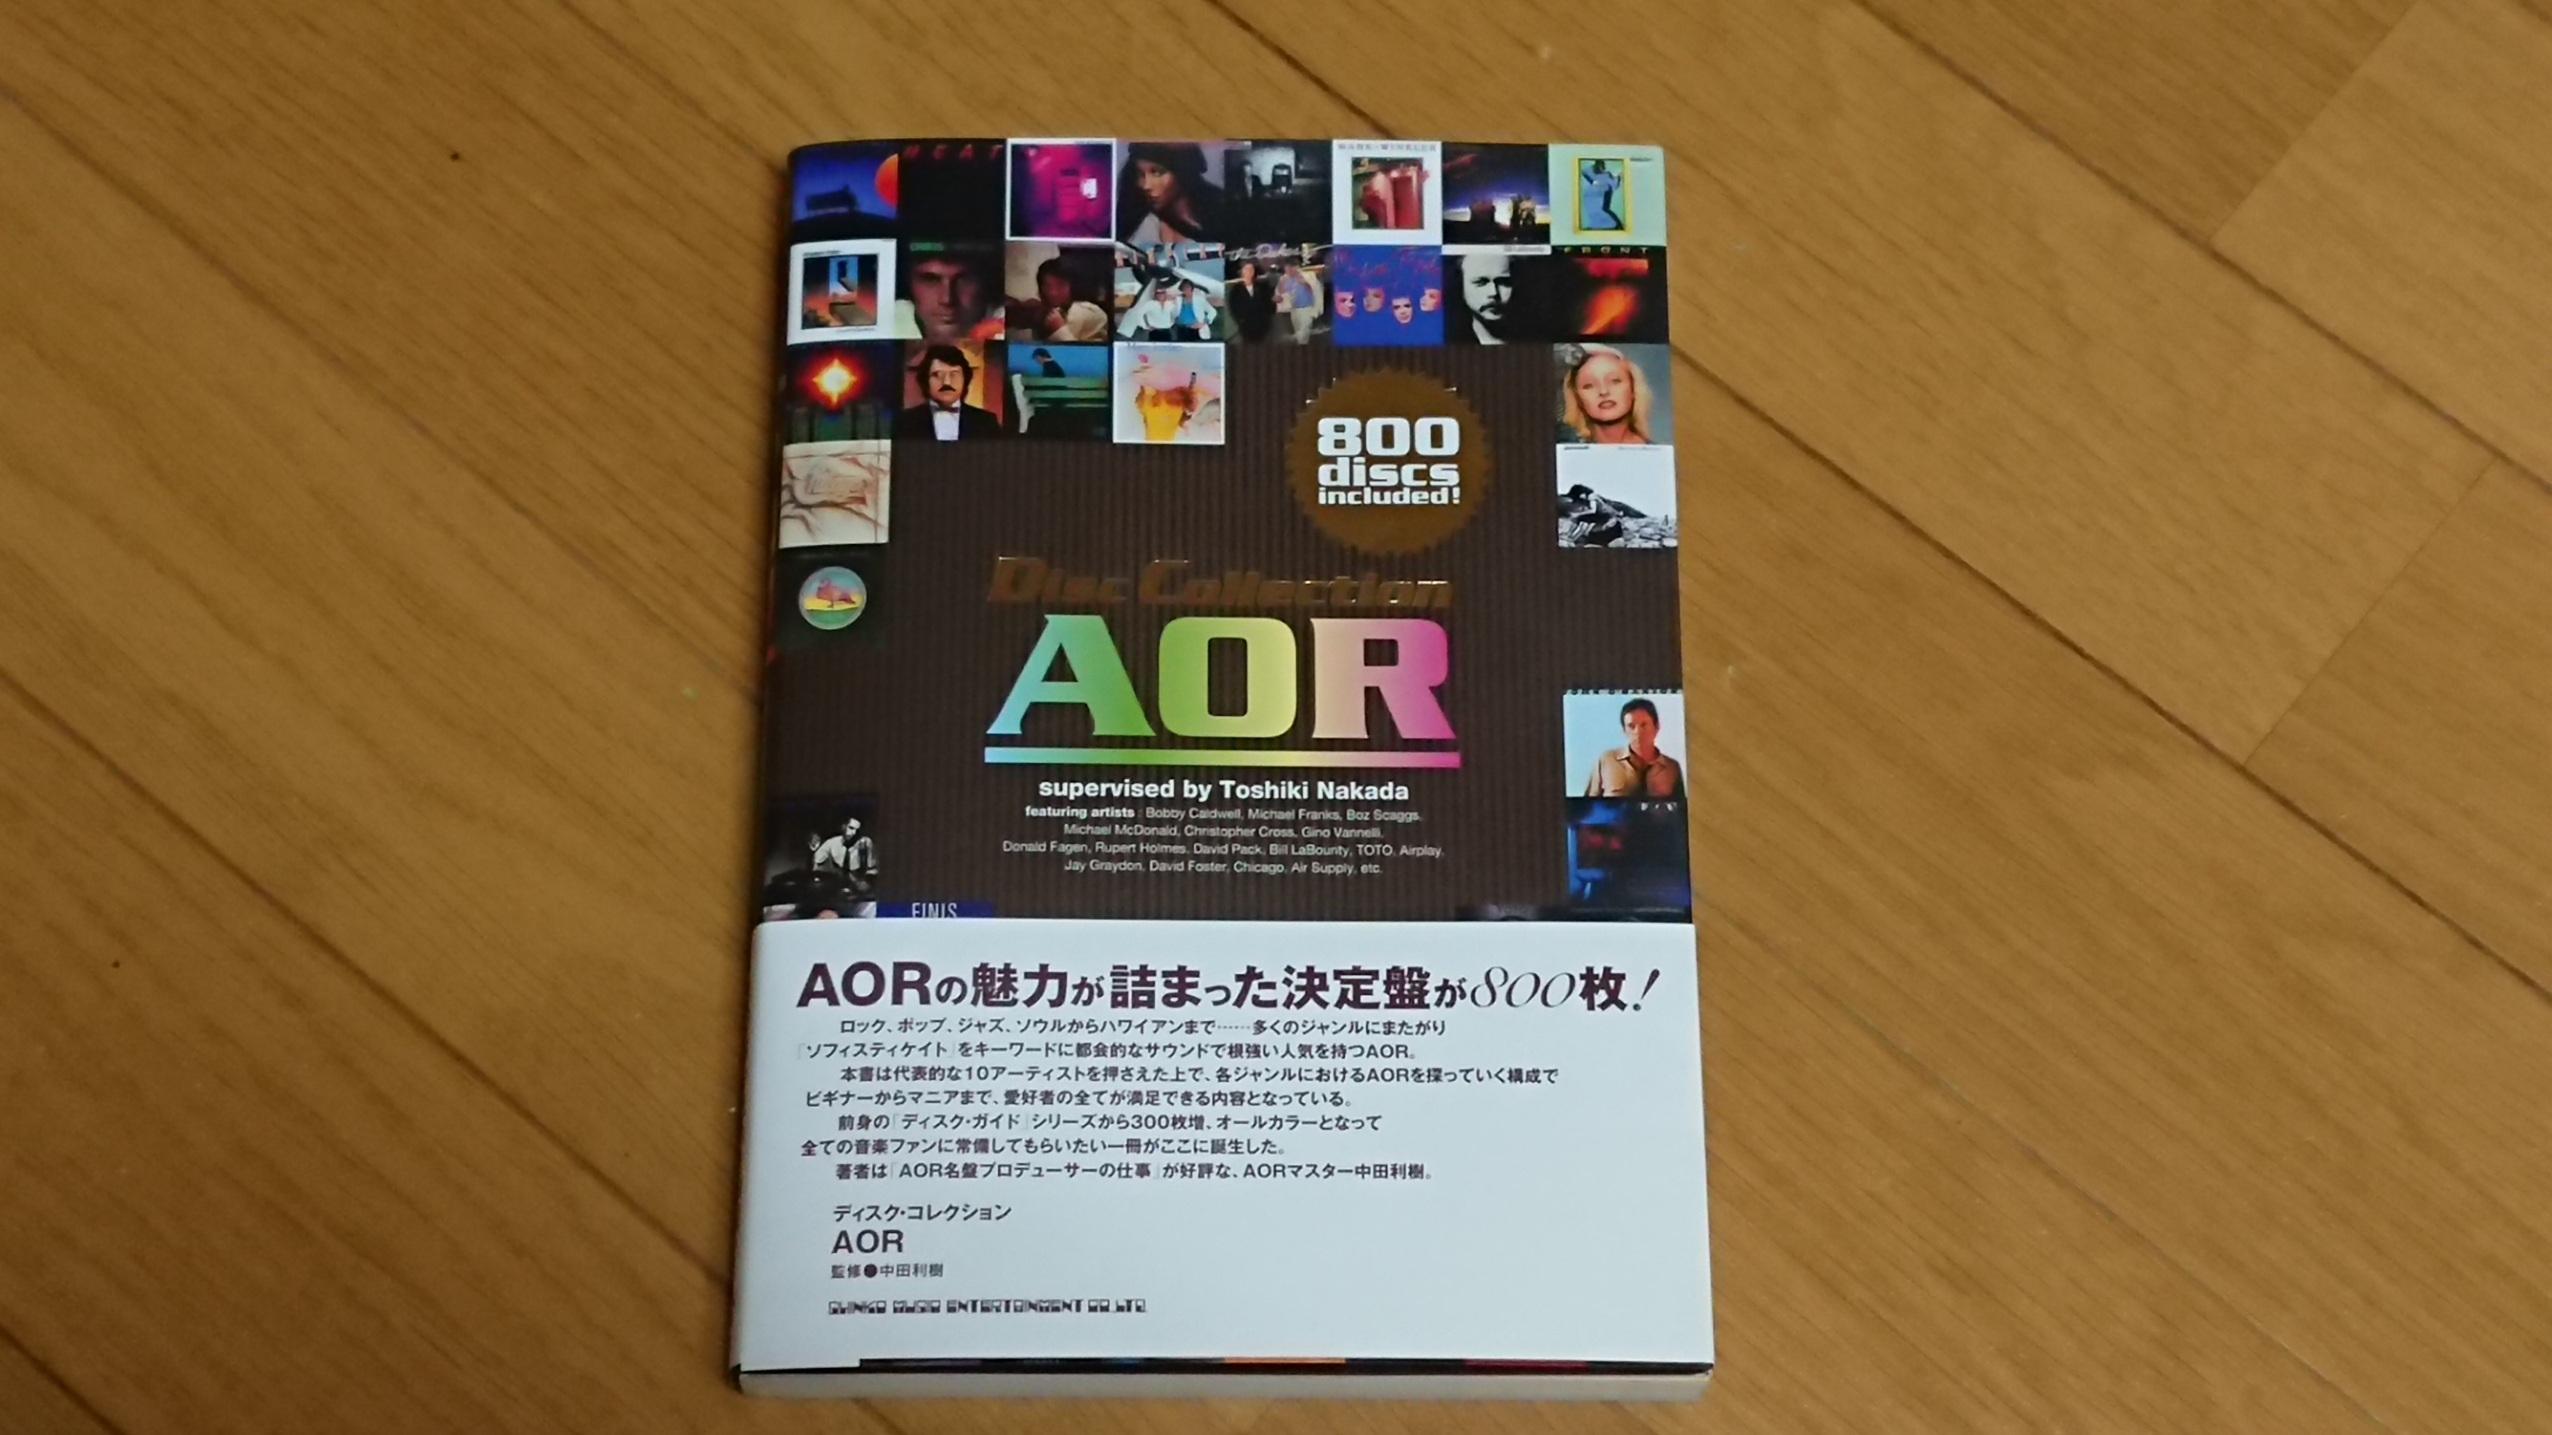 AOR disc Guide